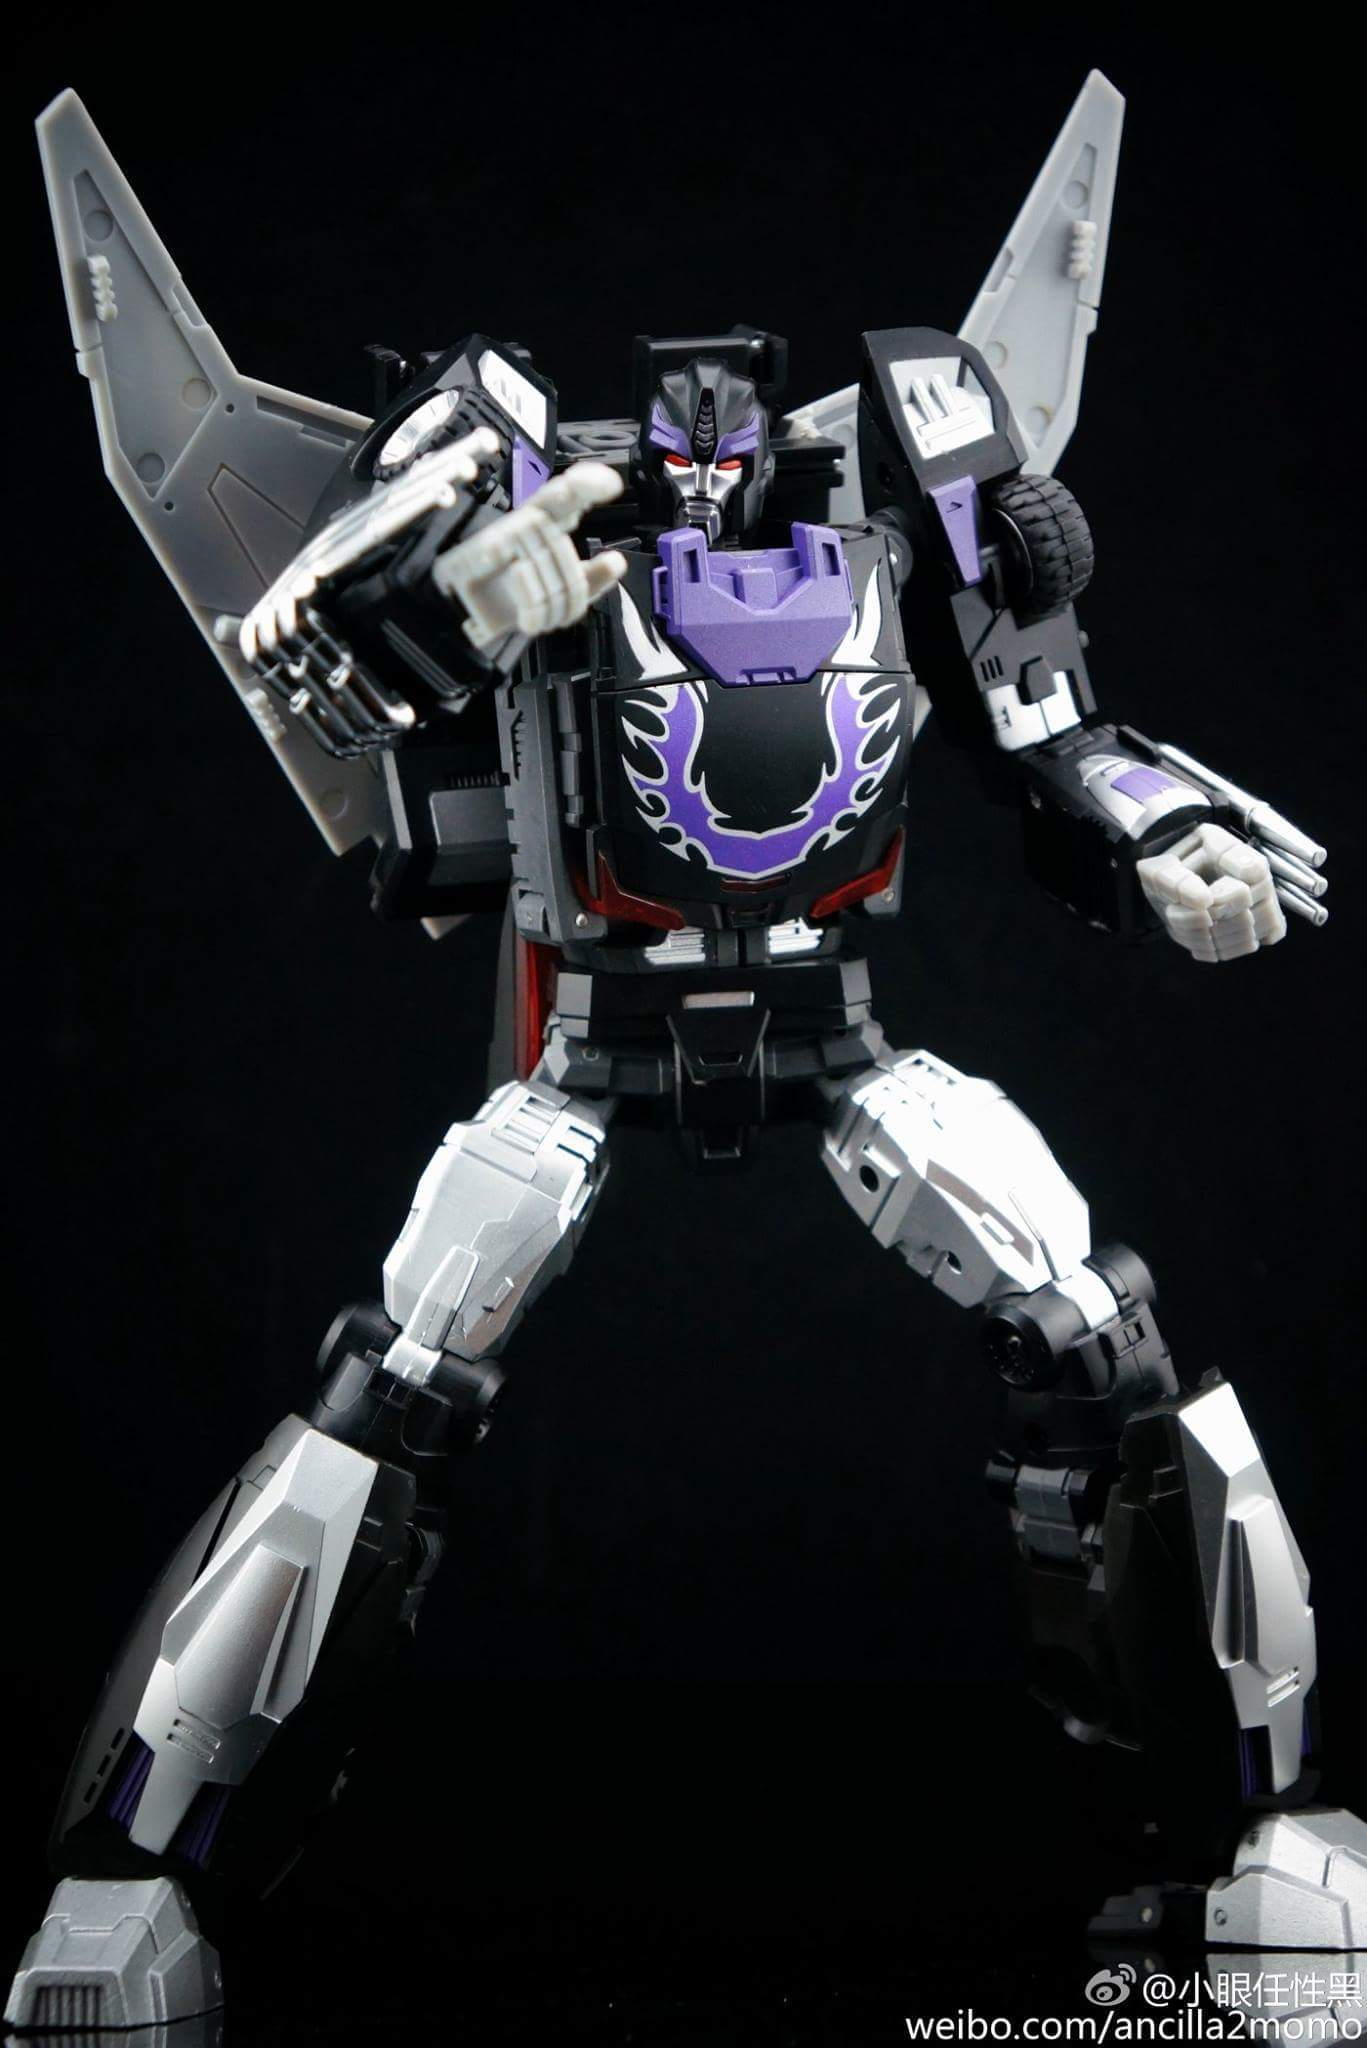 [DX9 Toys] Produit Tiers - Jouet D-06 Carry aka Rodimus et D-06T Terror aka Black Rodimus - Page 2 DoGUfhwO